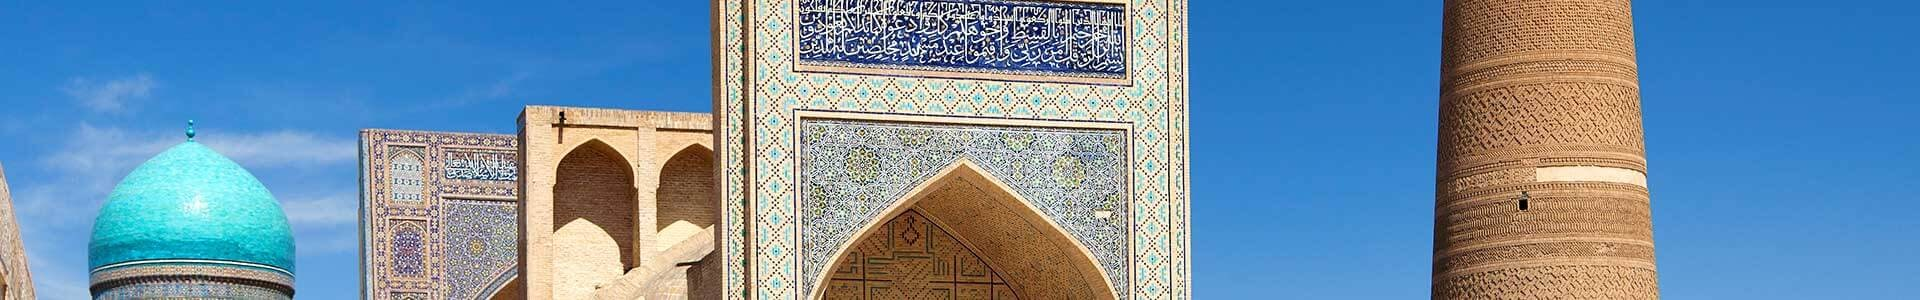 Voyage au Turkmenistan - TUI